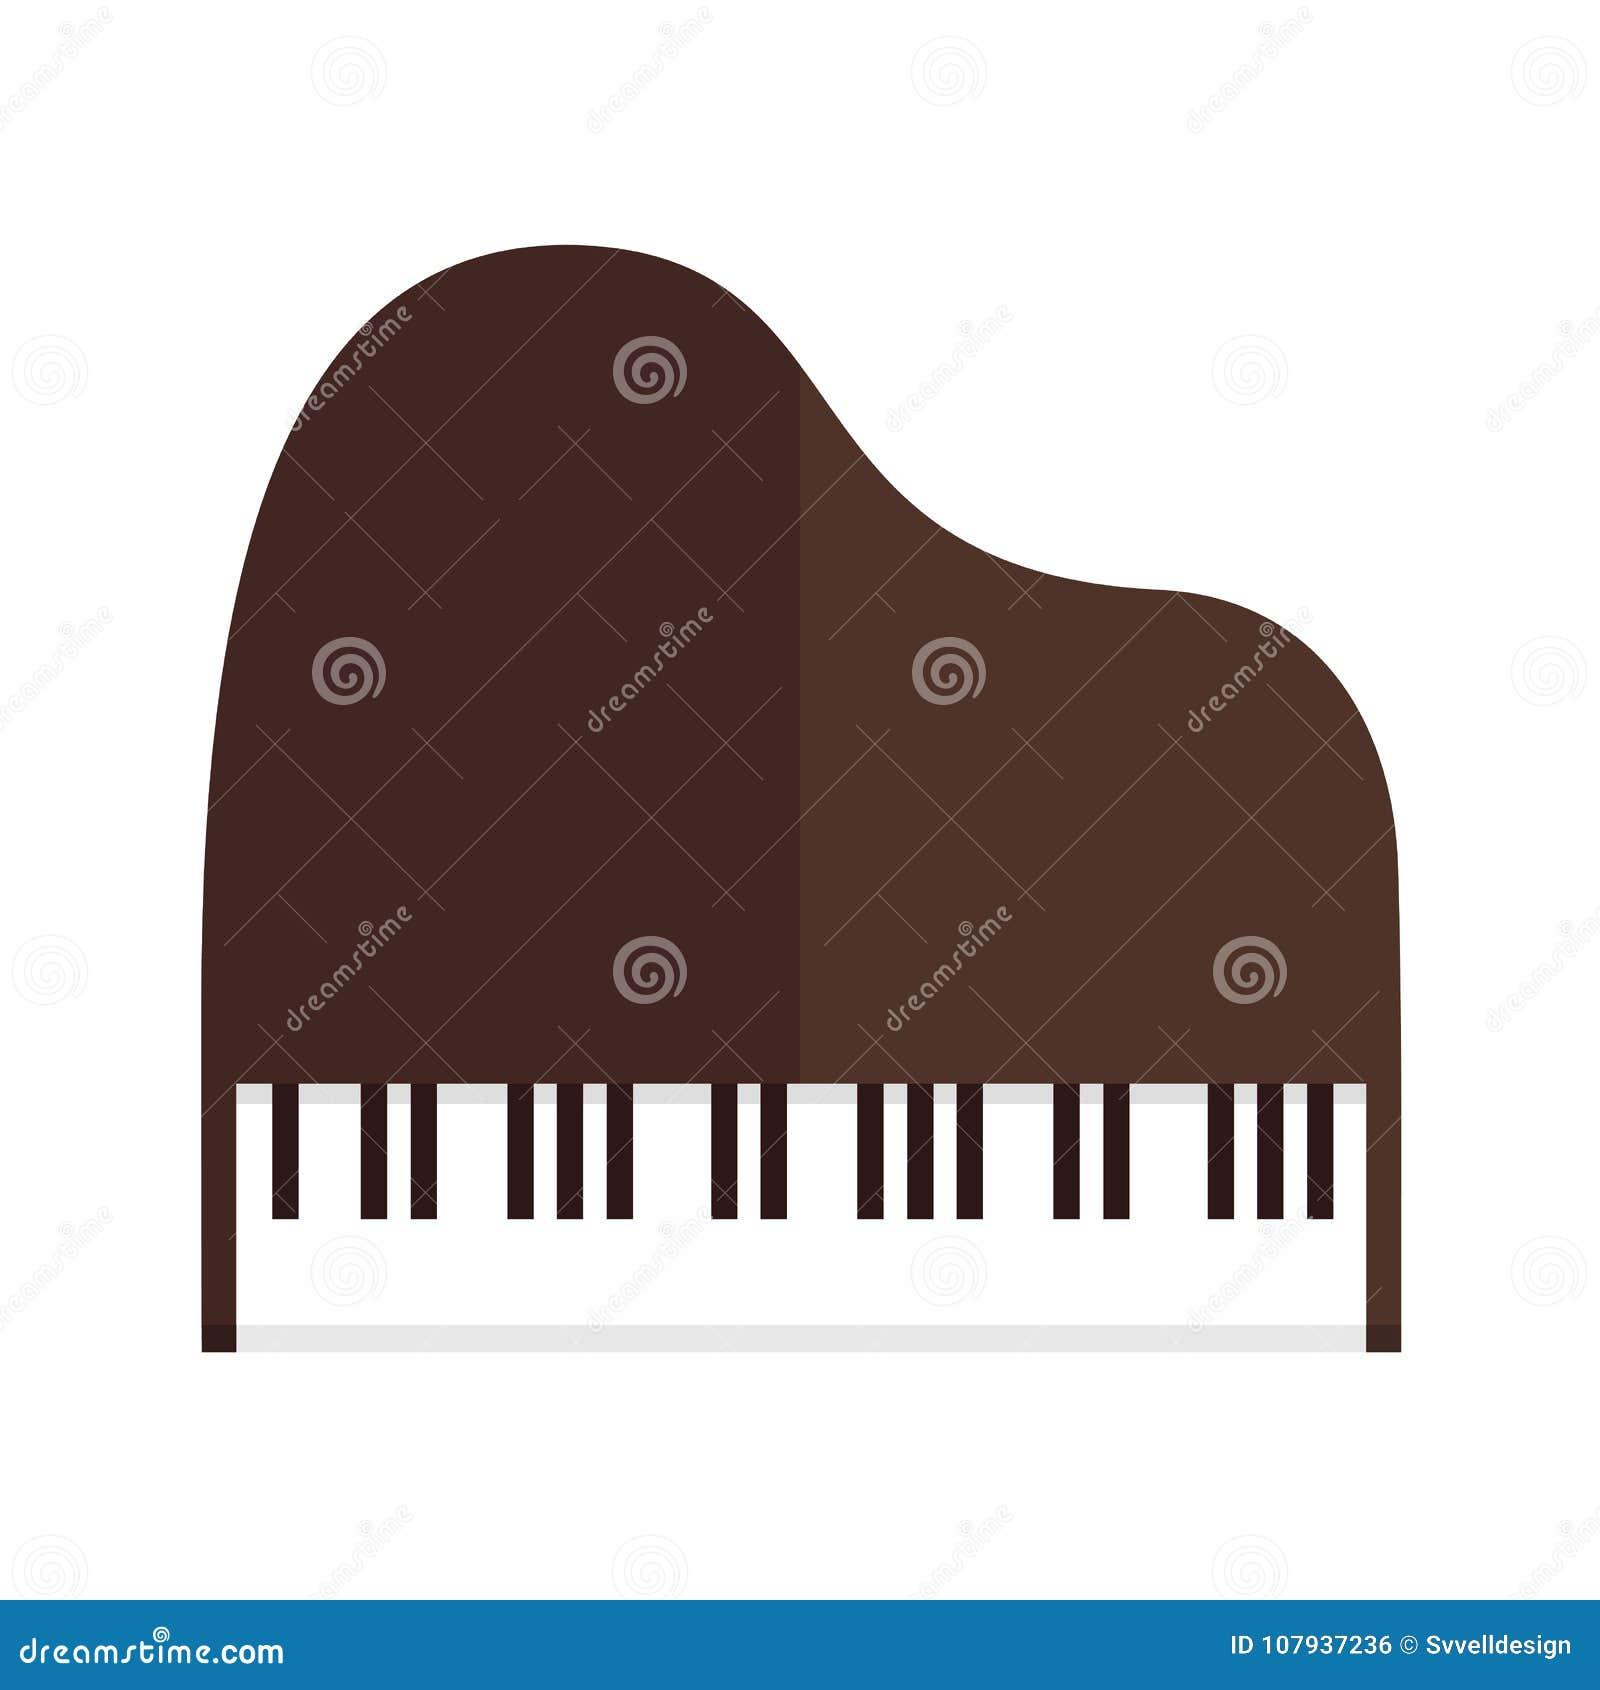 Simple Grand Piano Top View Vector Illustration Graphic Design